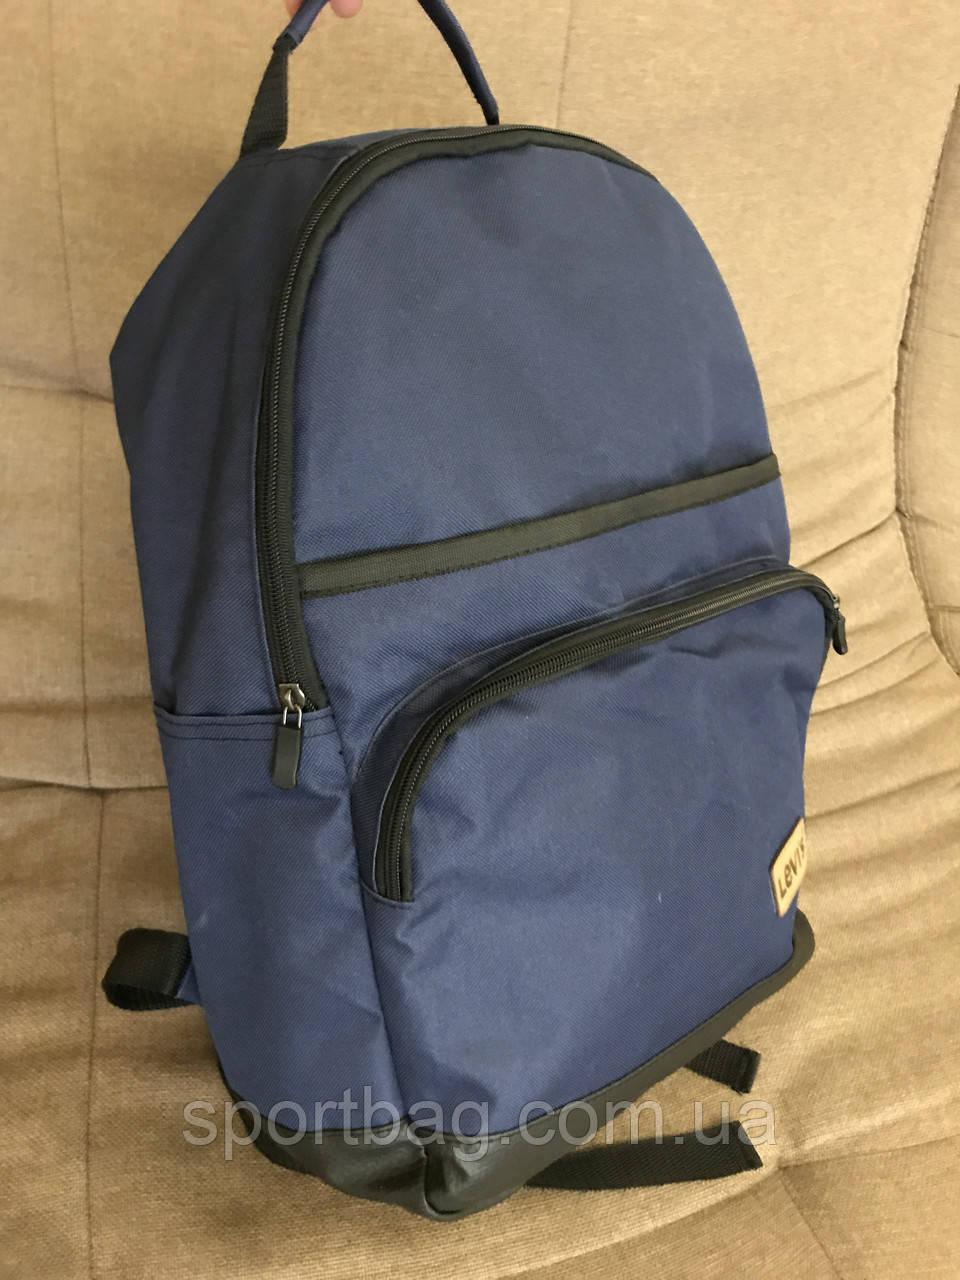 acmepower рюкзак для зарядки айфон